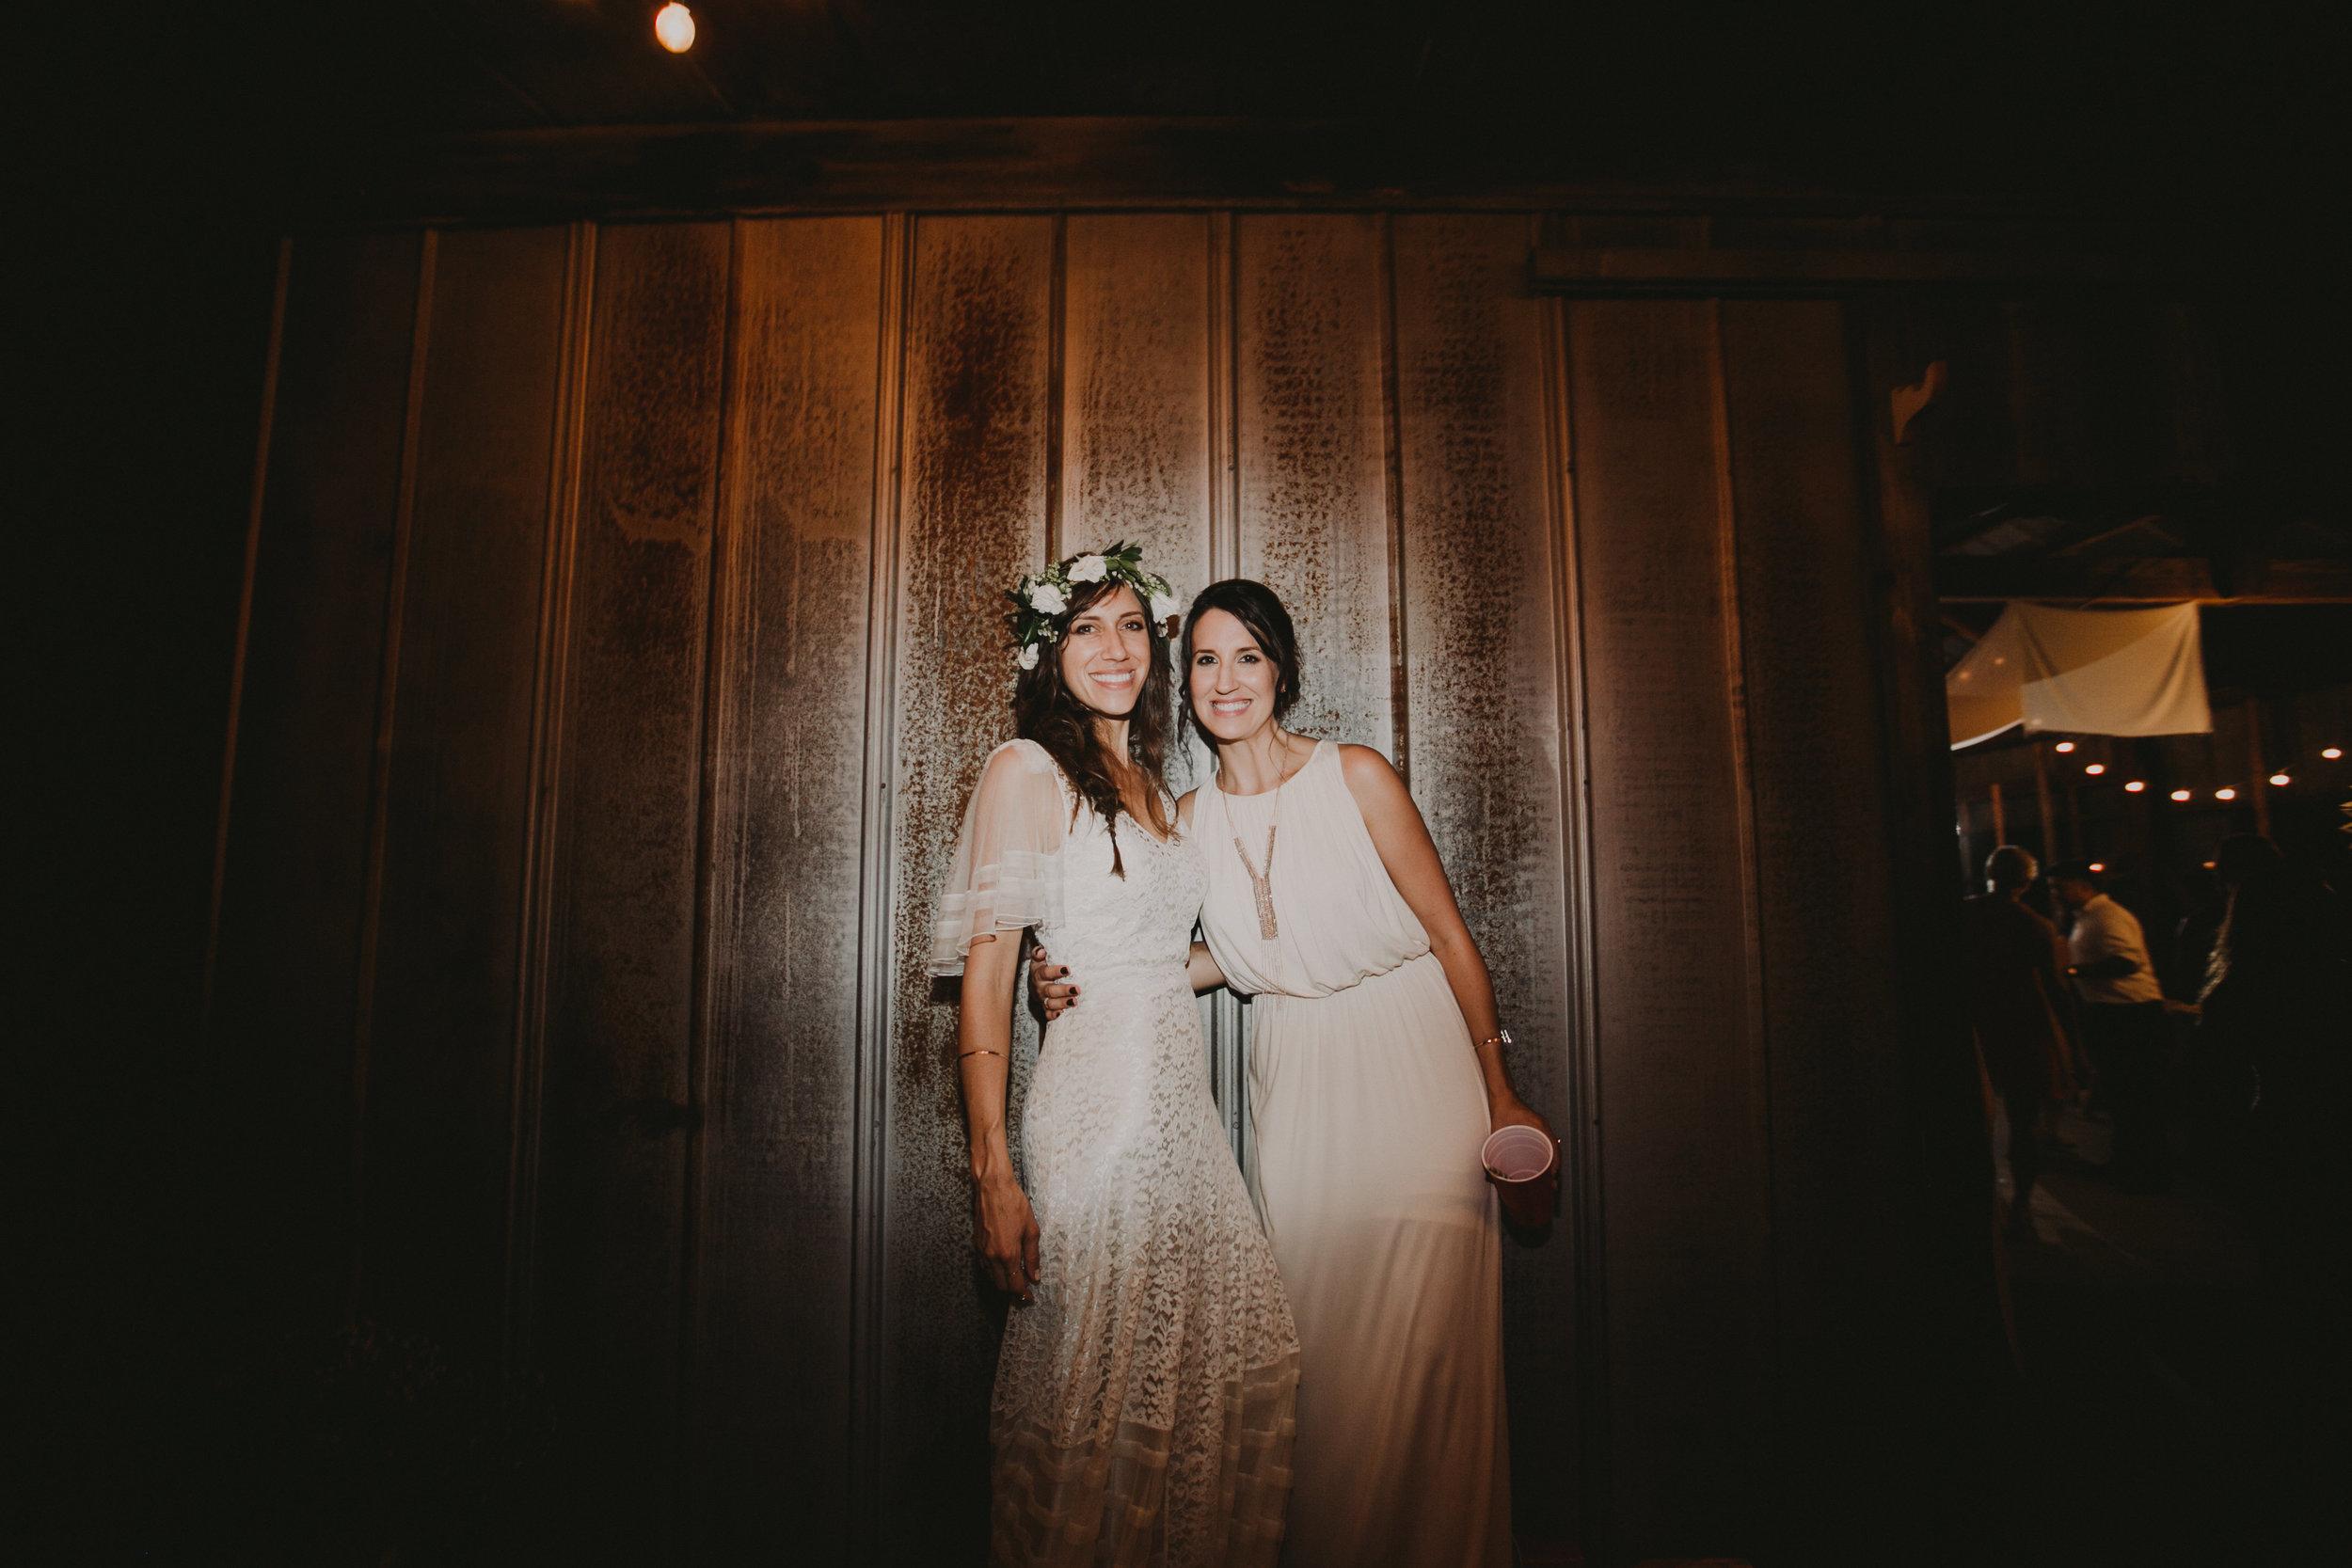 LIBERTY_VIEW_FARM_HIGHLAND_NY_WEDDING_CHELLISE_MICHAEL_PHOTOGRAPHY948.JPG